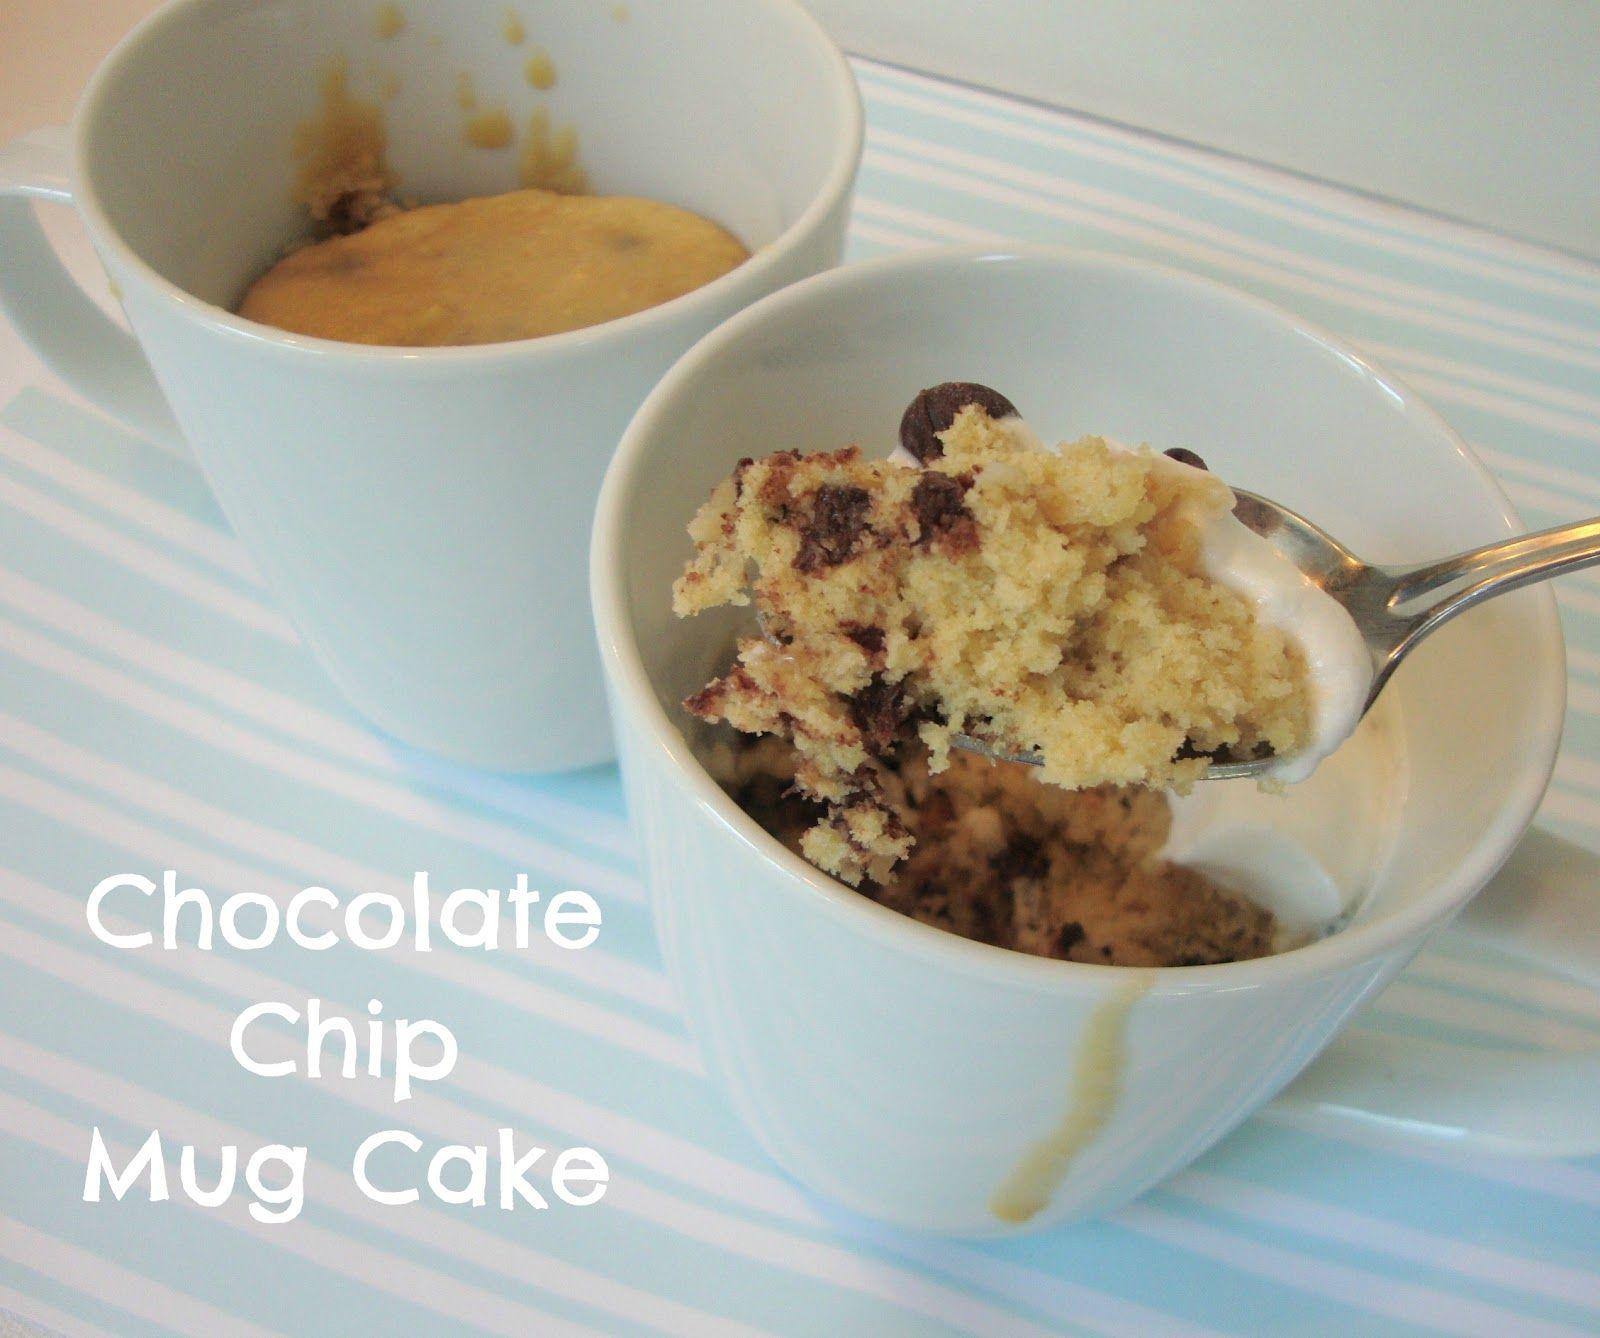 Chocolate Chip Cookie Dough Mug Cake